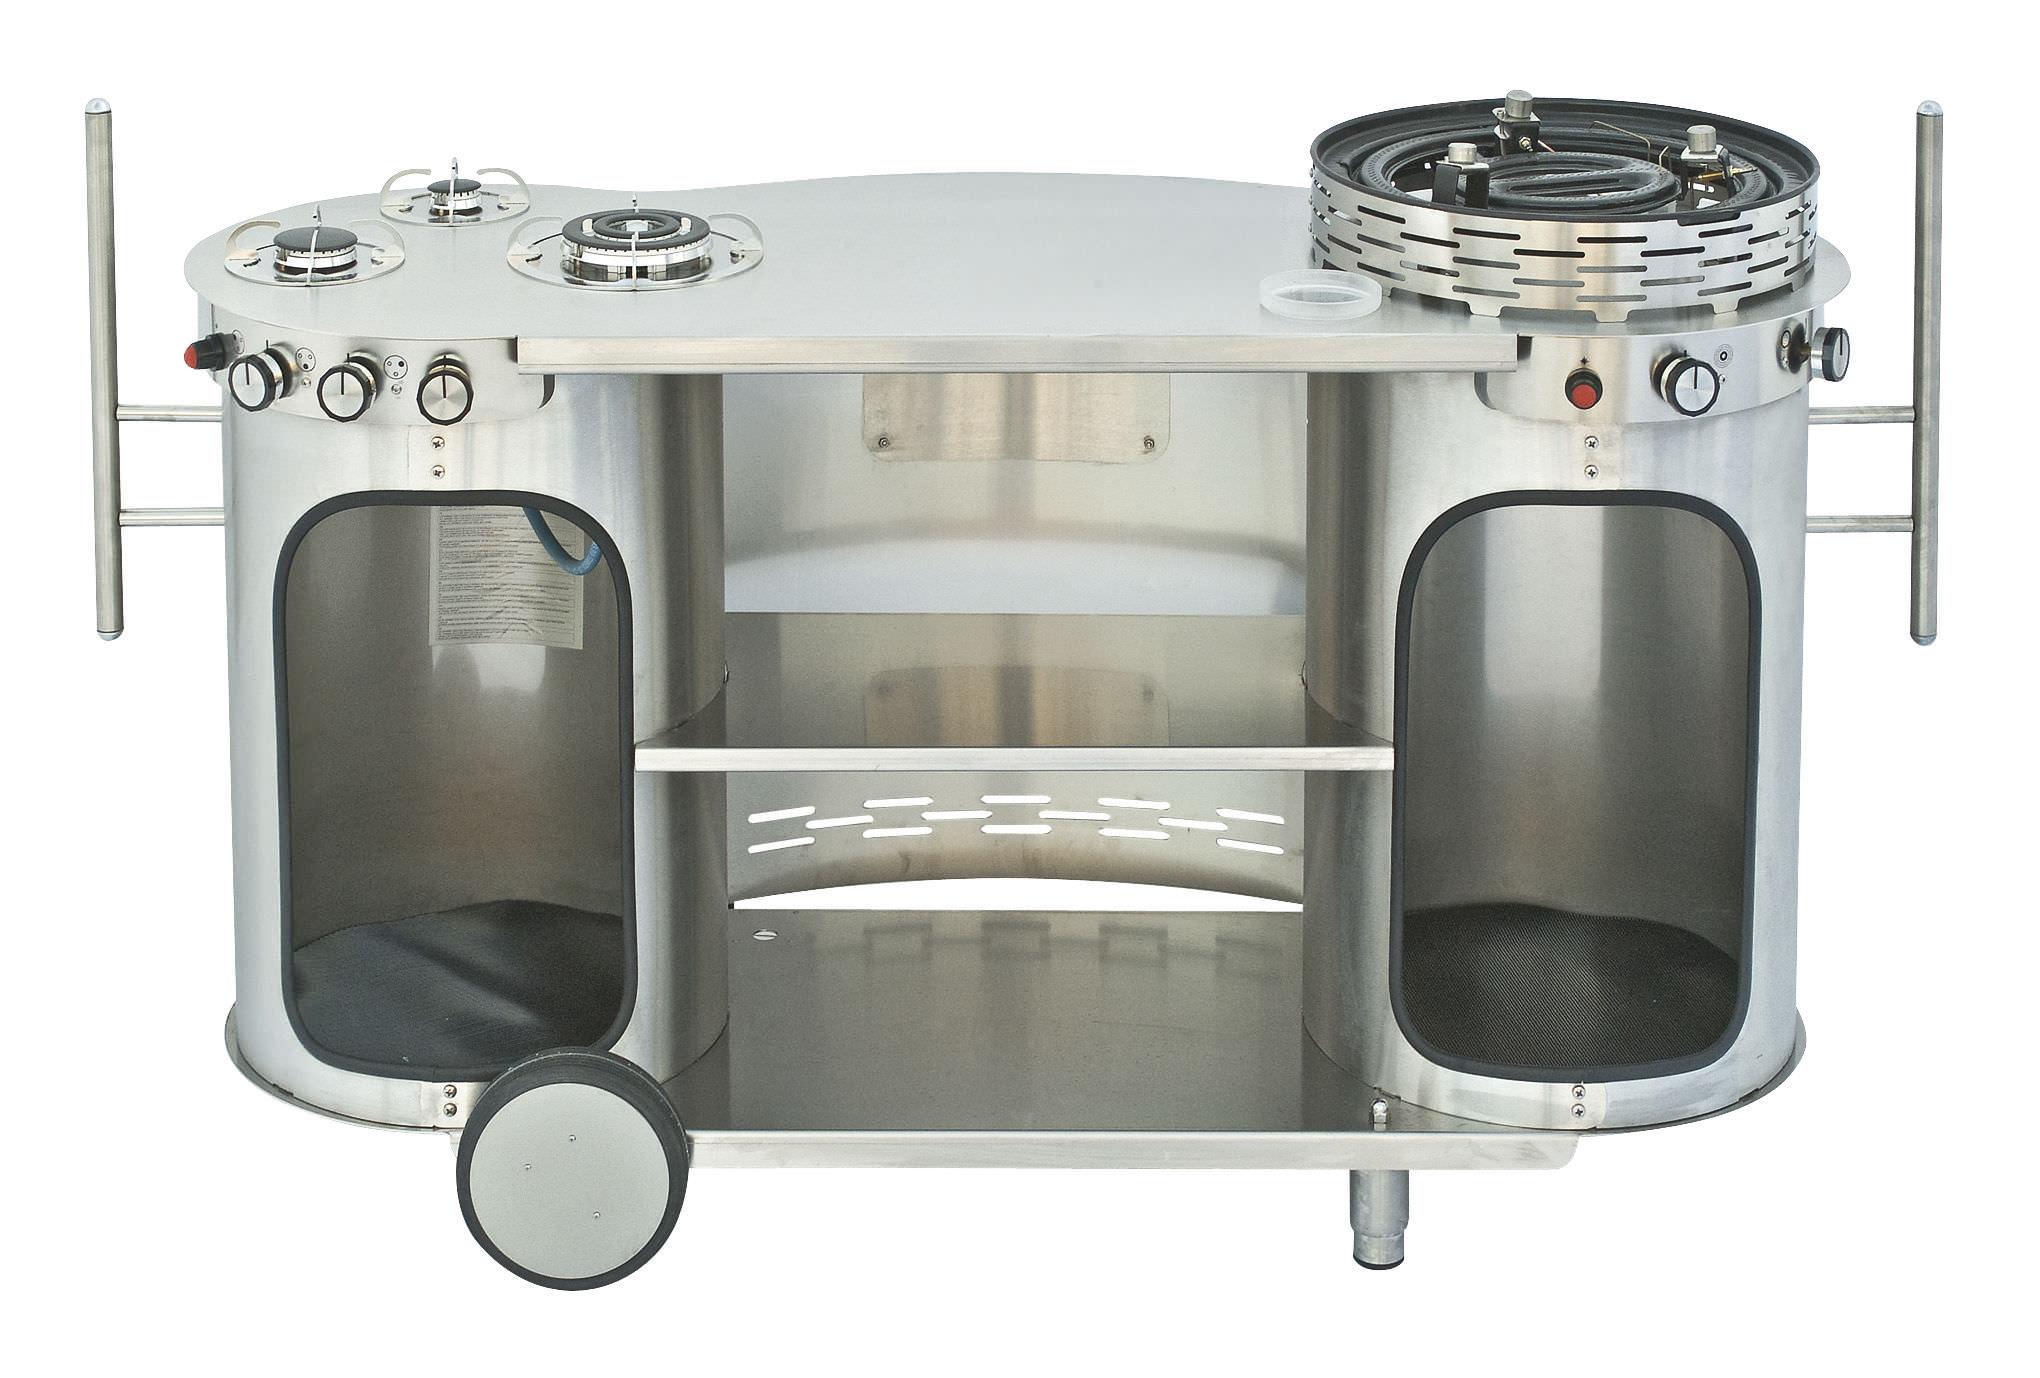 Cucina in acciaio inox / modulare / professionale / mobile ...